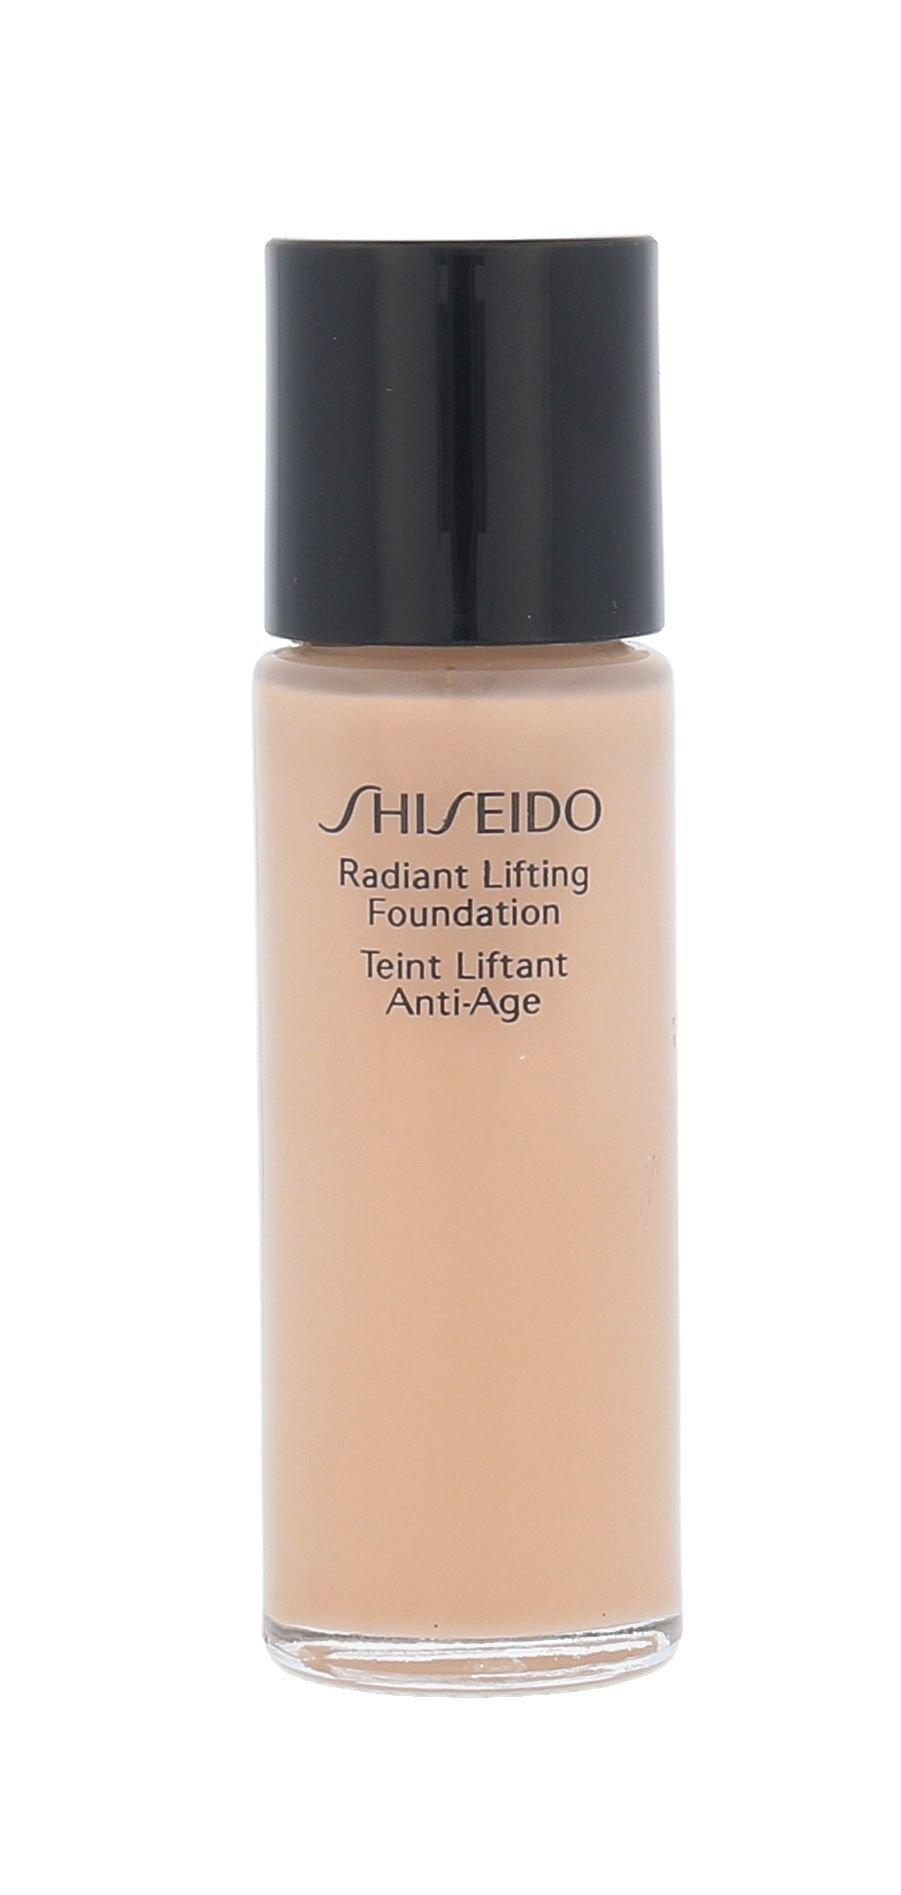 Shiseido Radiant Lifting Foundation Cosmetic 15ml O40 Natural Fair Ochre